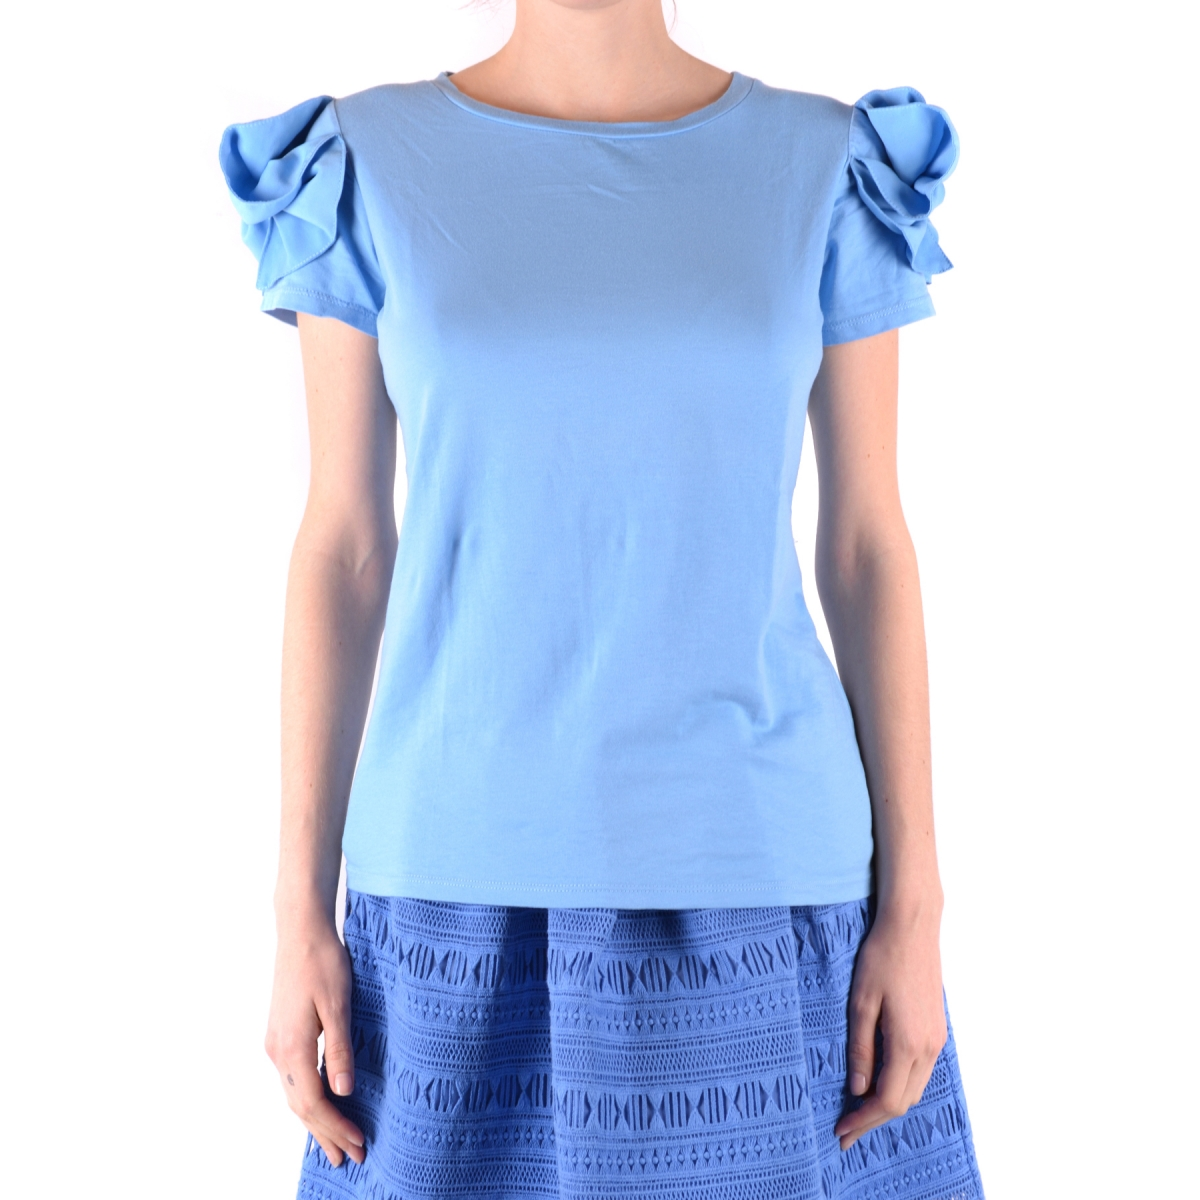 Tshirt Manica Corta Rosao 37516IT -20%